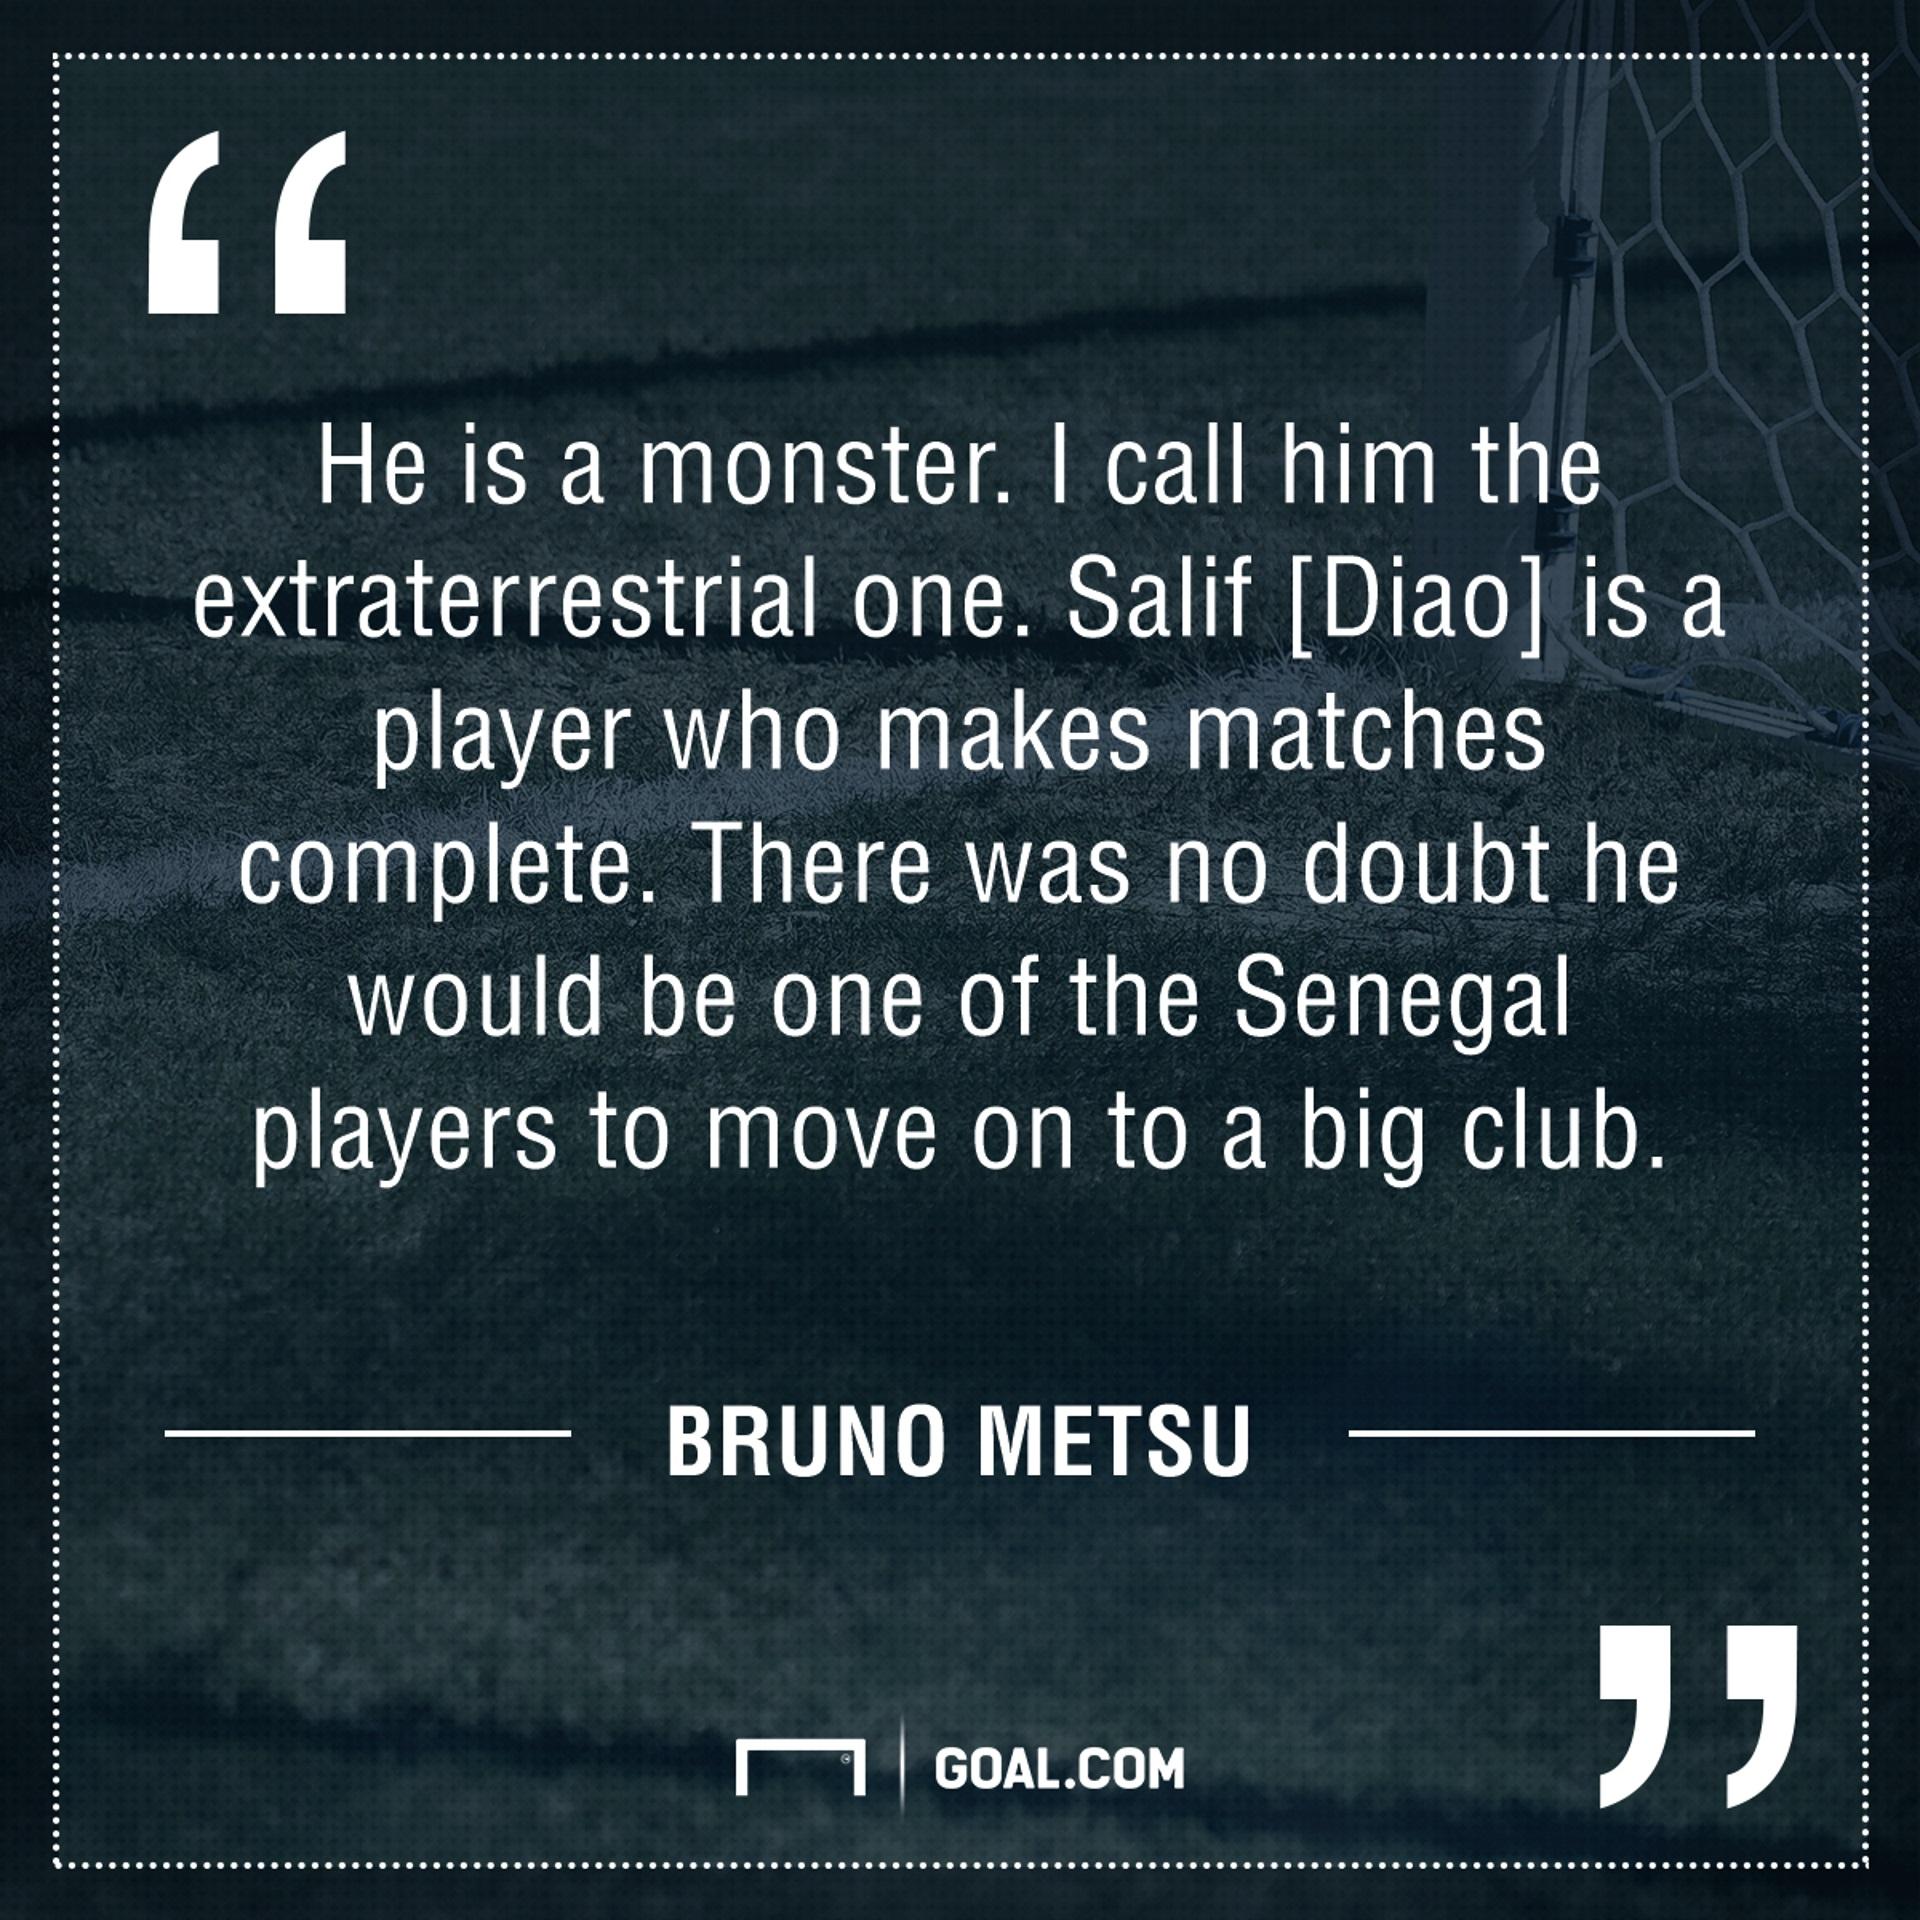 Bruno Metsu on Salif Diao